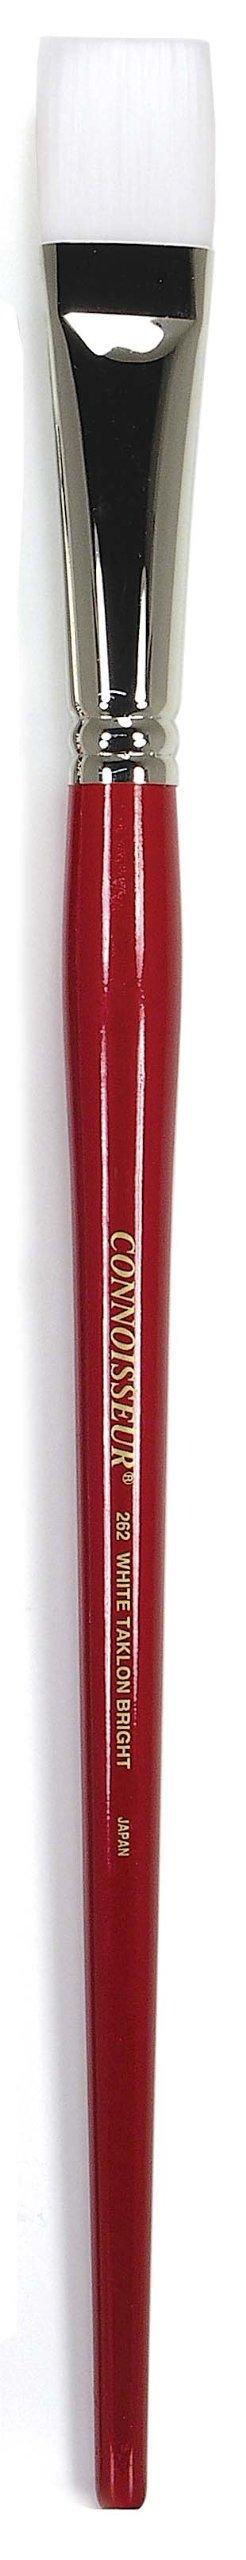 Connoisseur White Taklon All Media Brush, #2 Bright